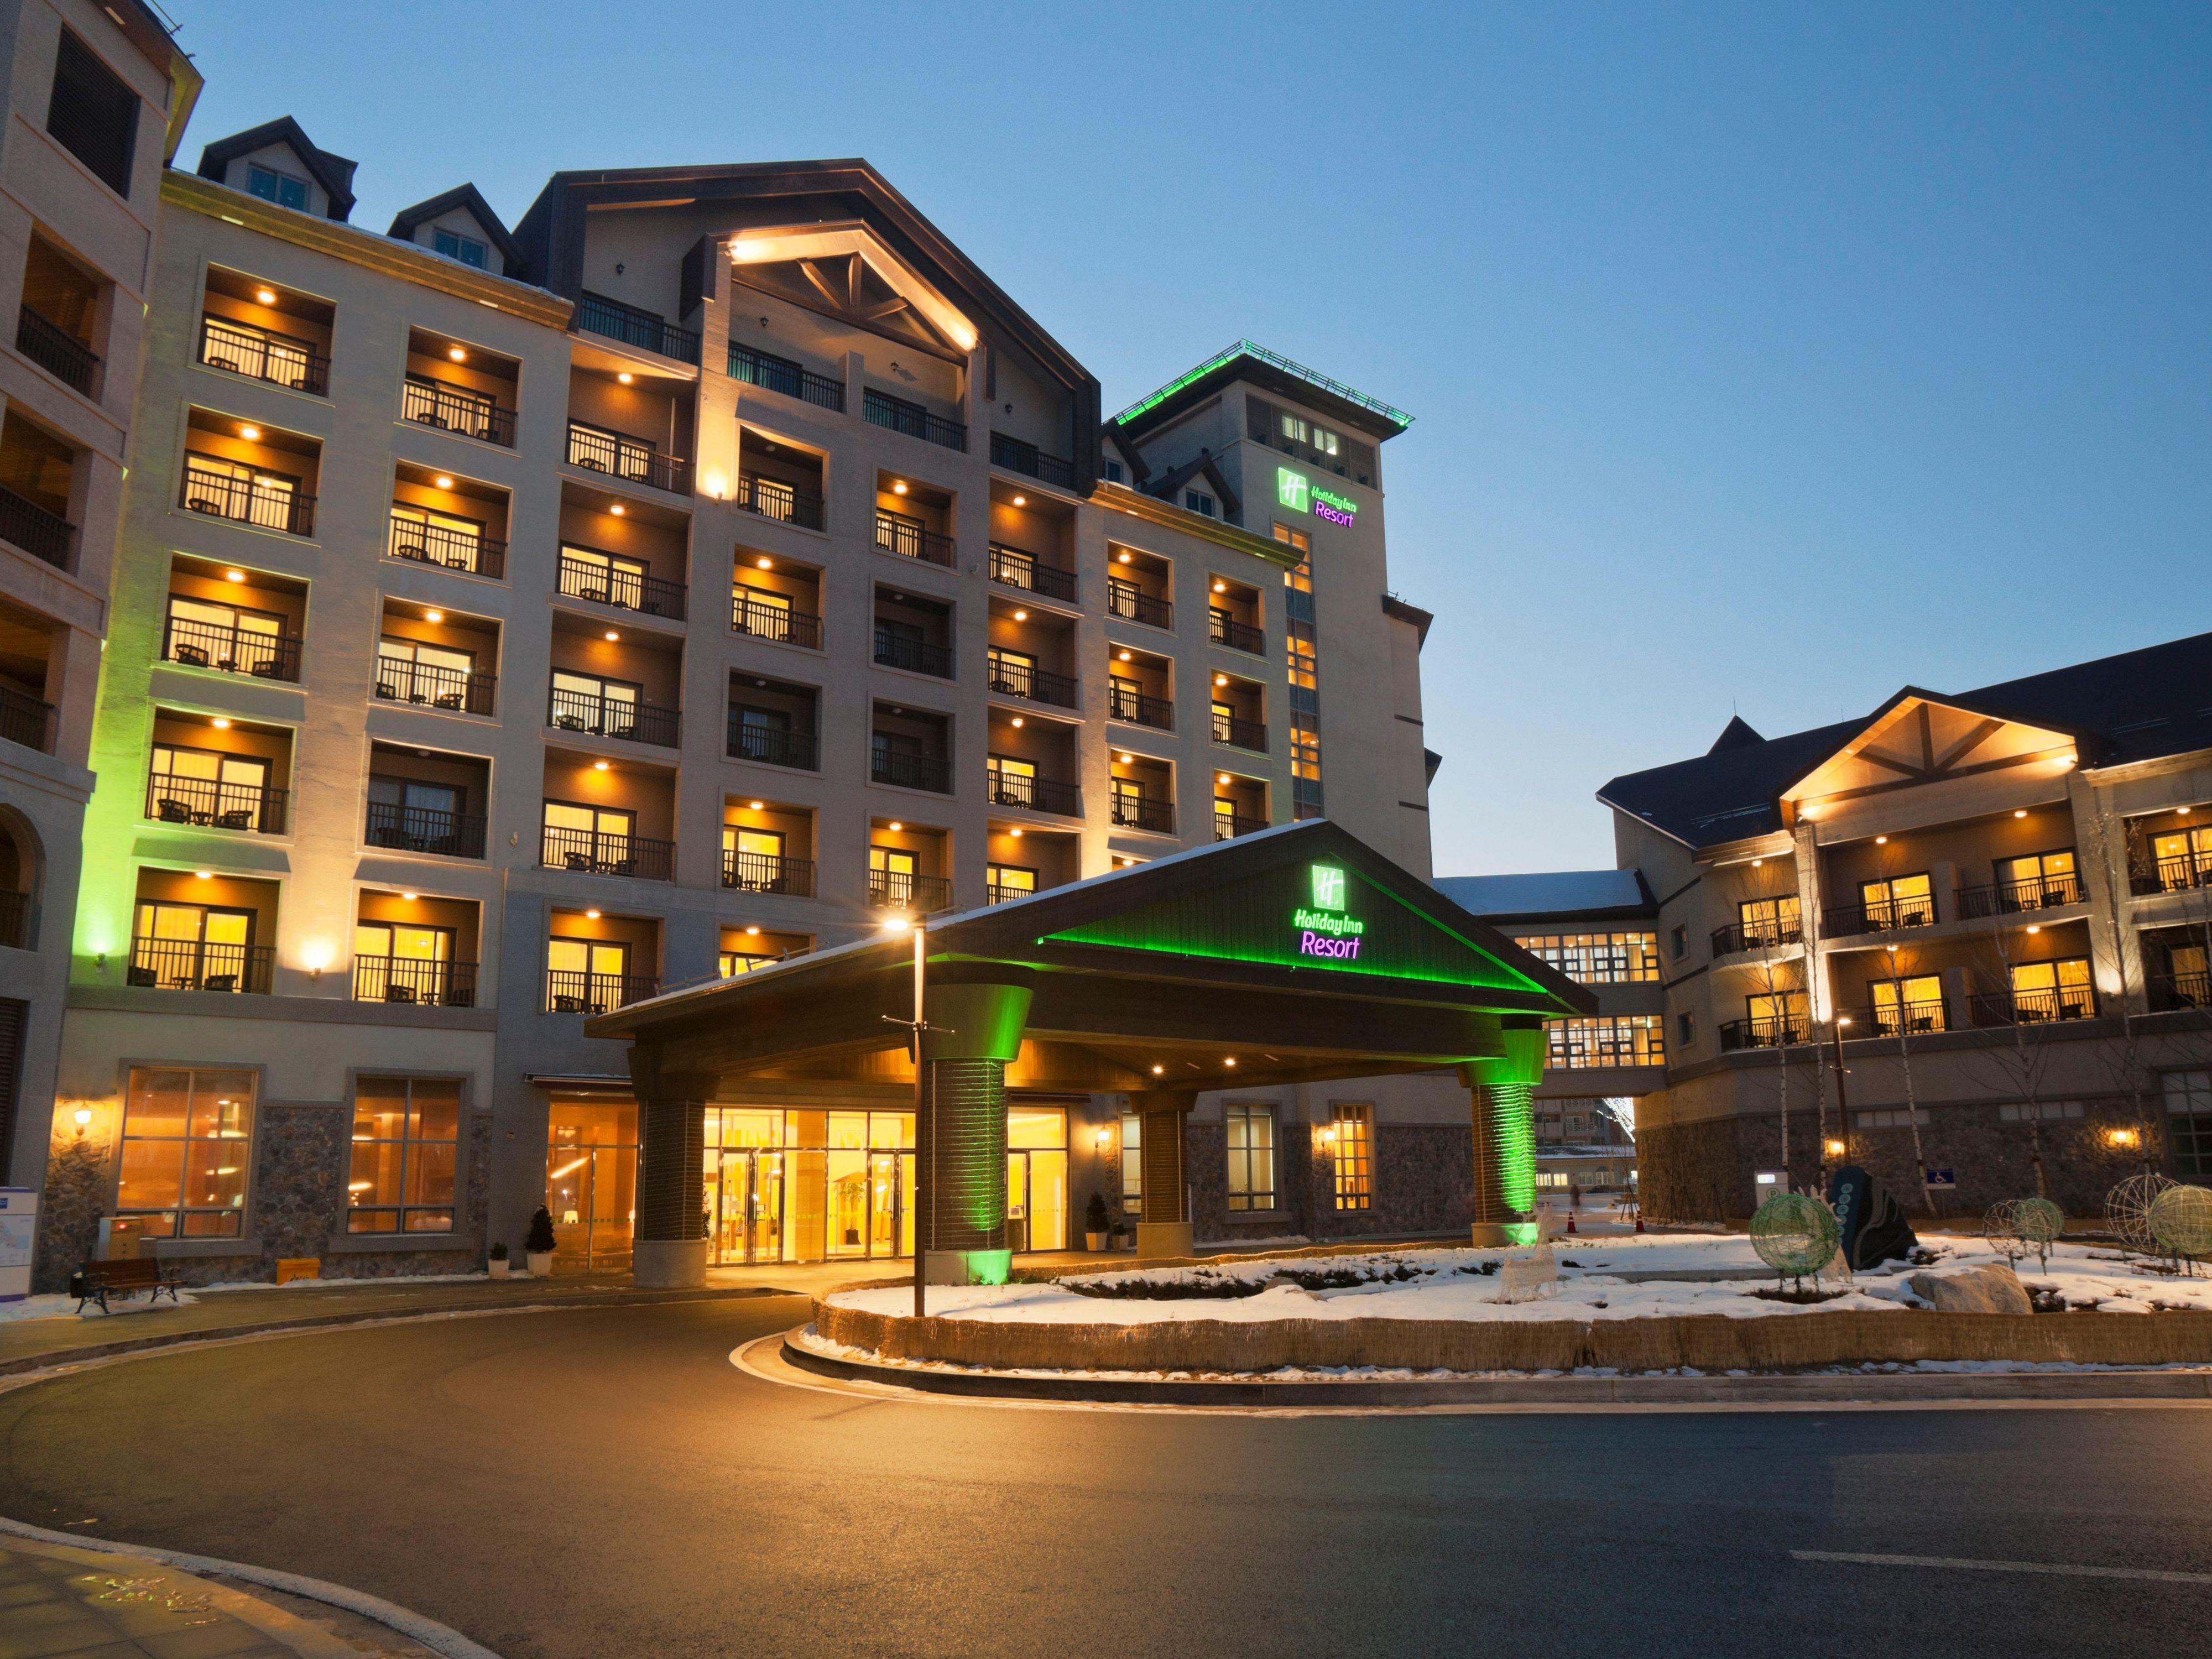 Holiday Inn Resort Alpensia Pyeongchang Hotel by IHG